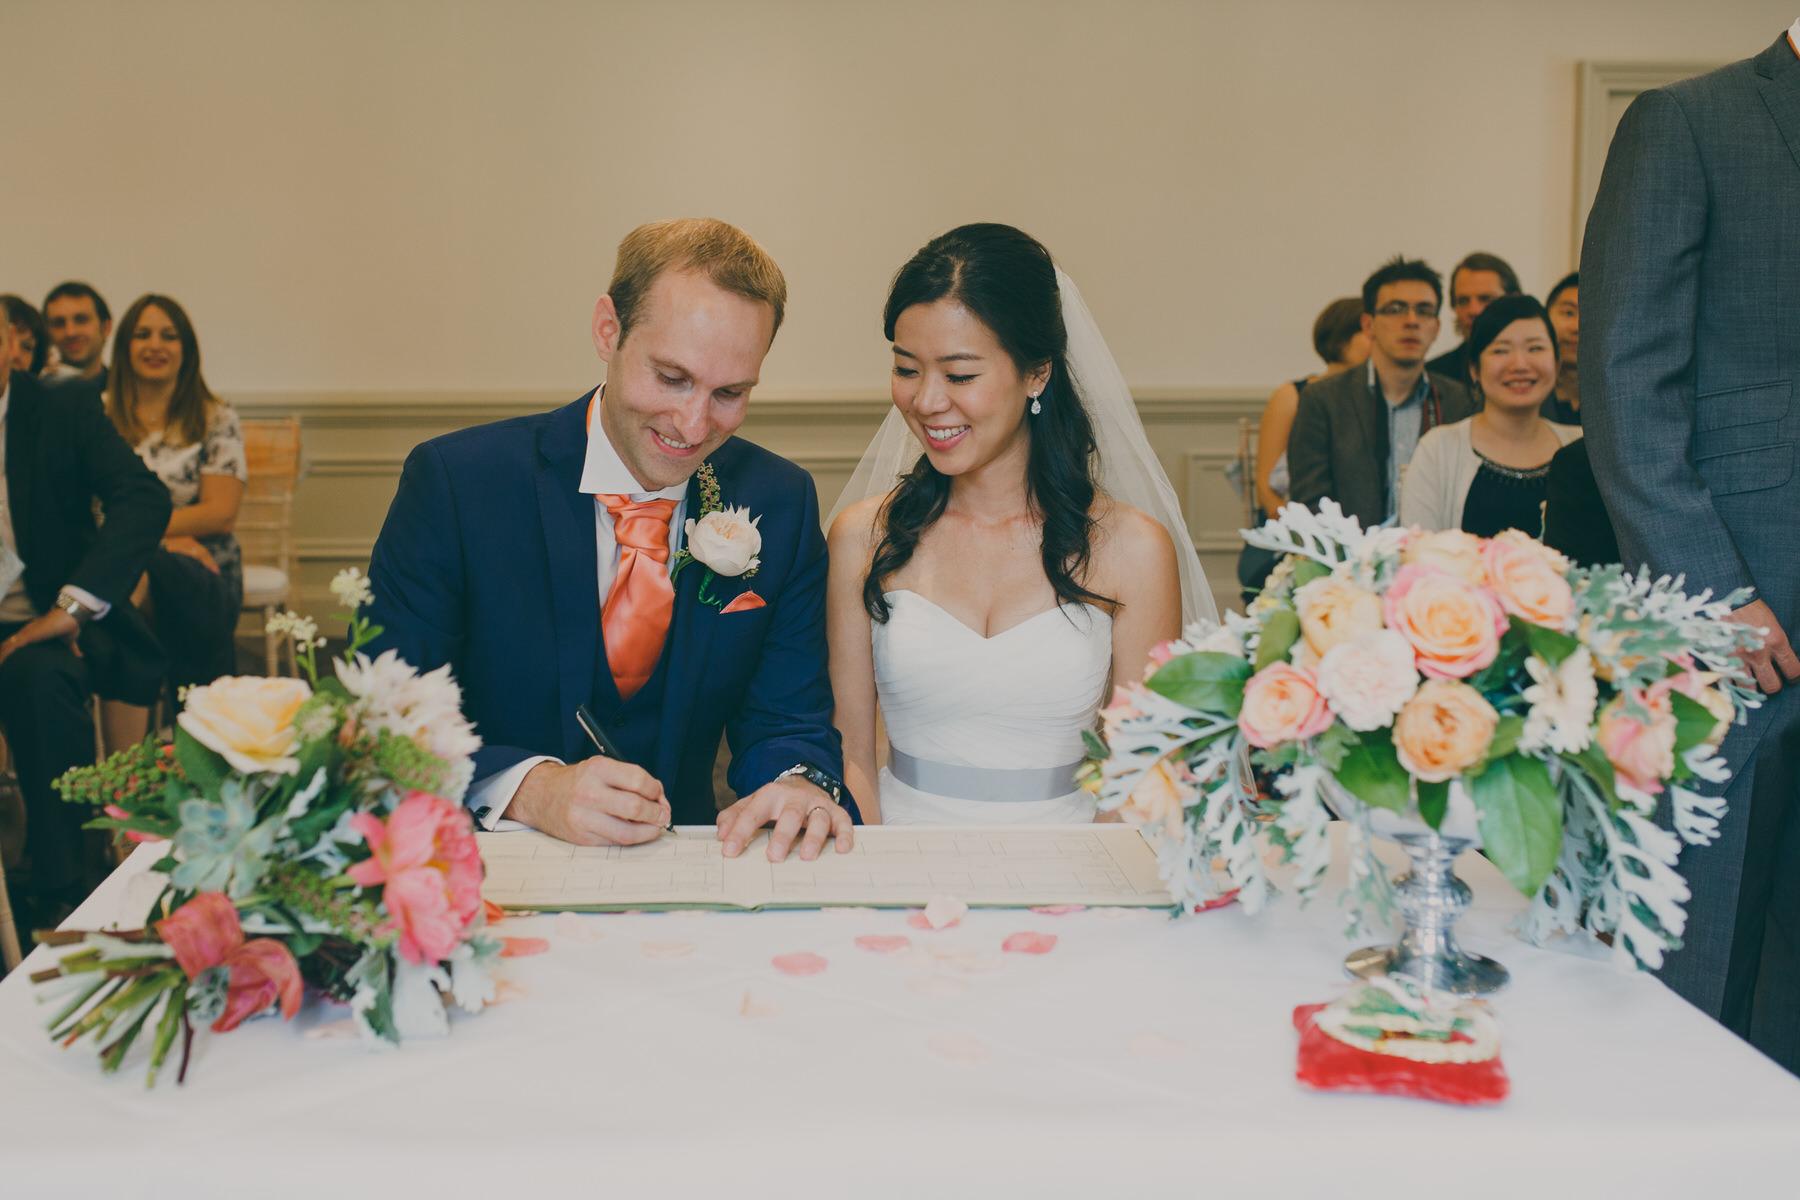 204 signing register Surrey documentary stle wedding photography.jpg